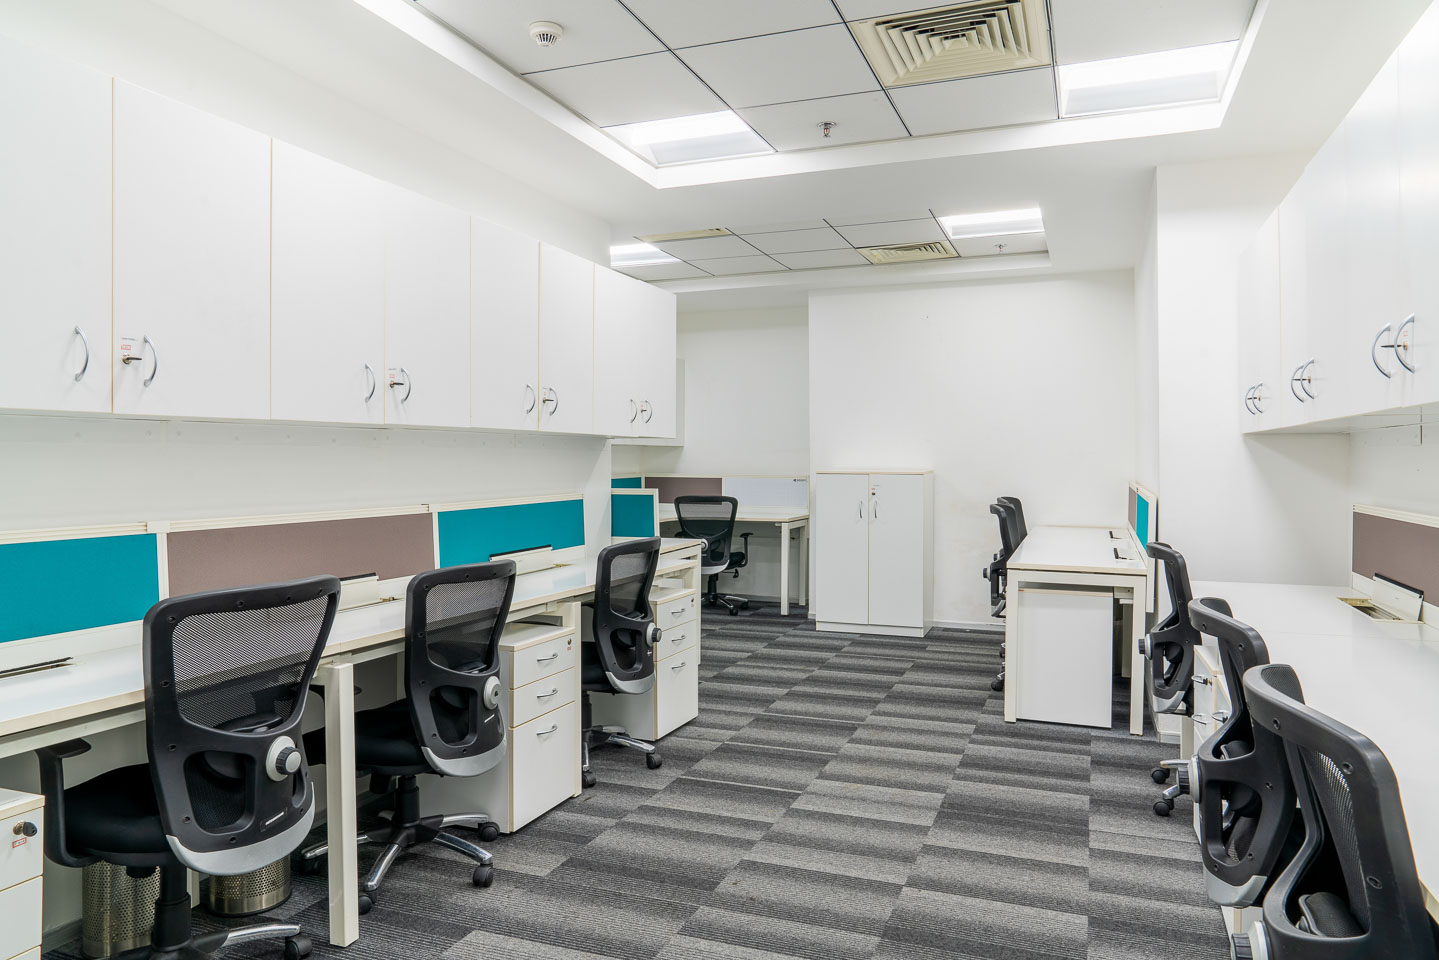 Coworking space in Marathahalli, Bangalore